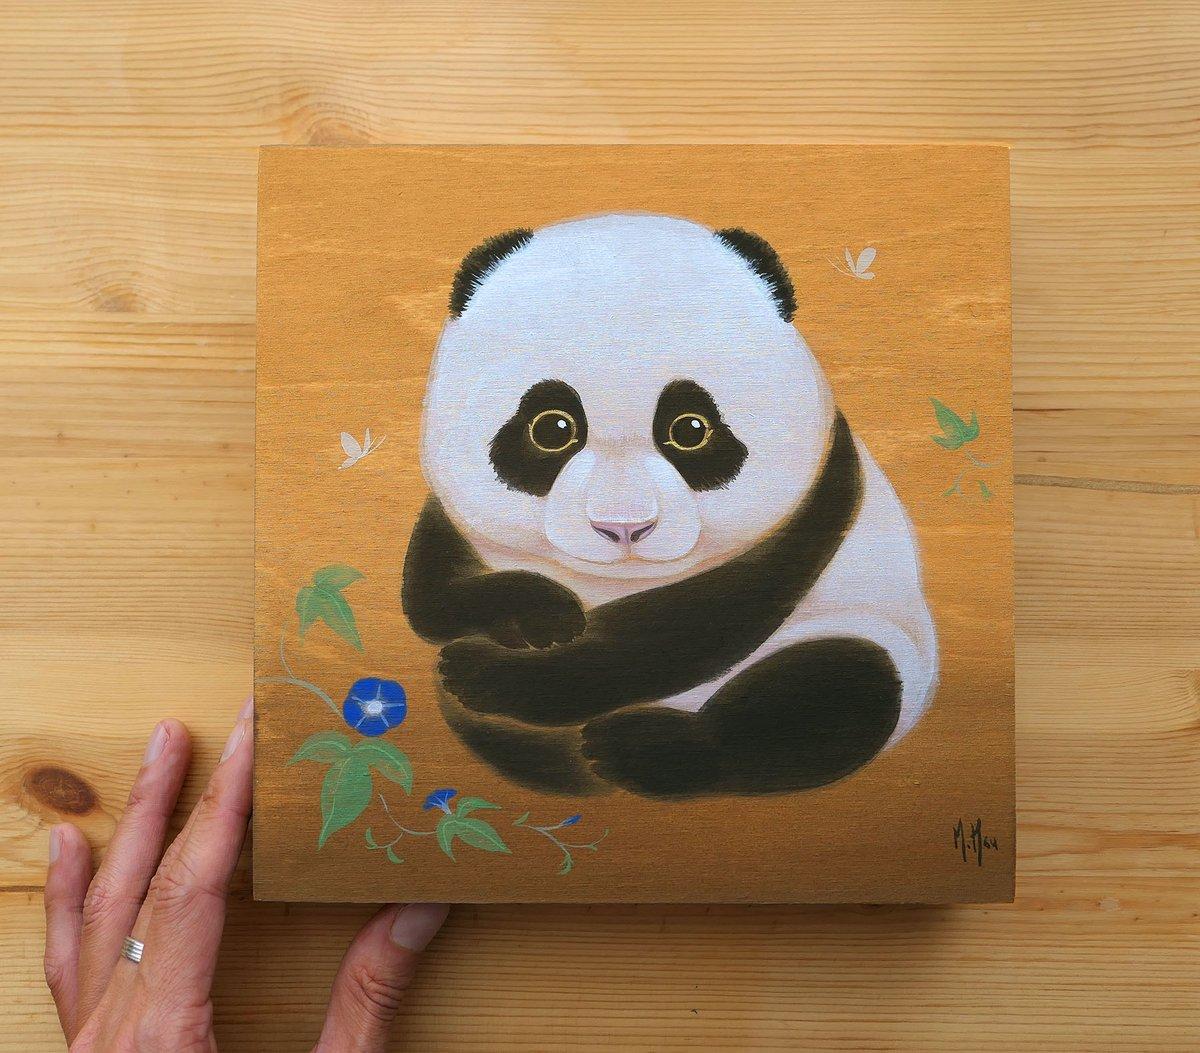 Panda Cub - Tian Tian